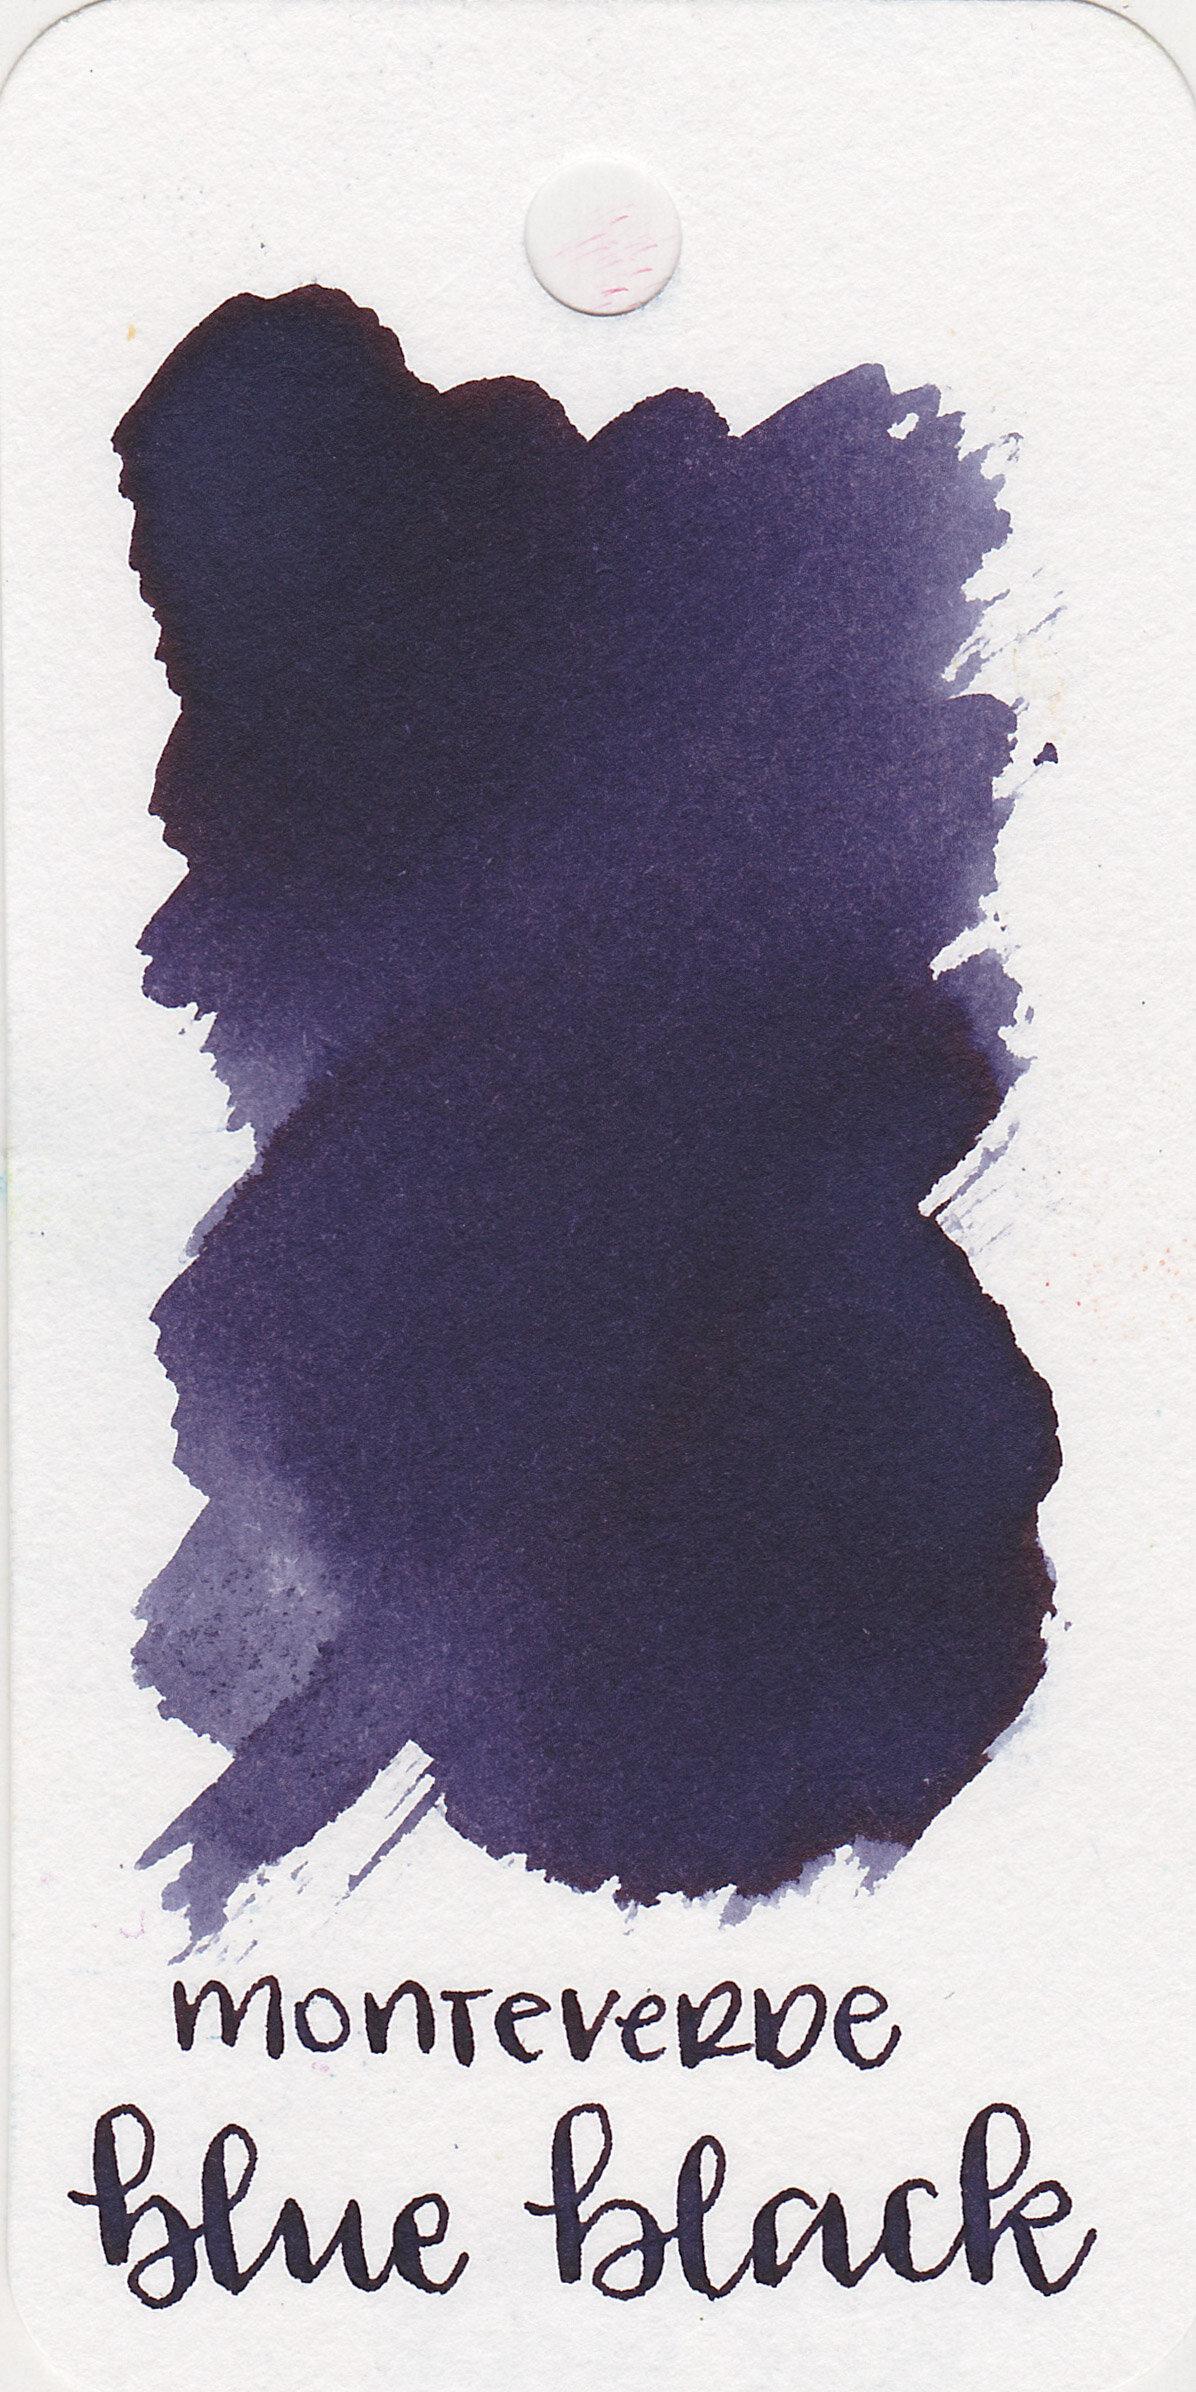 mv-blue-black-1.jpg